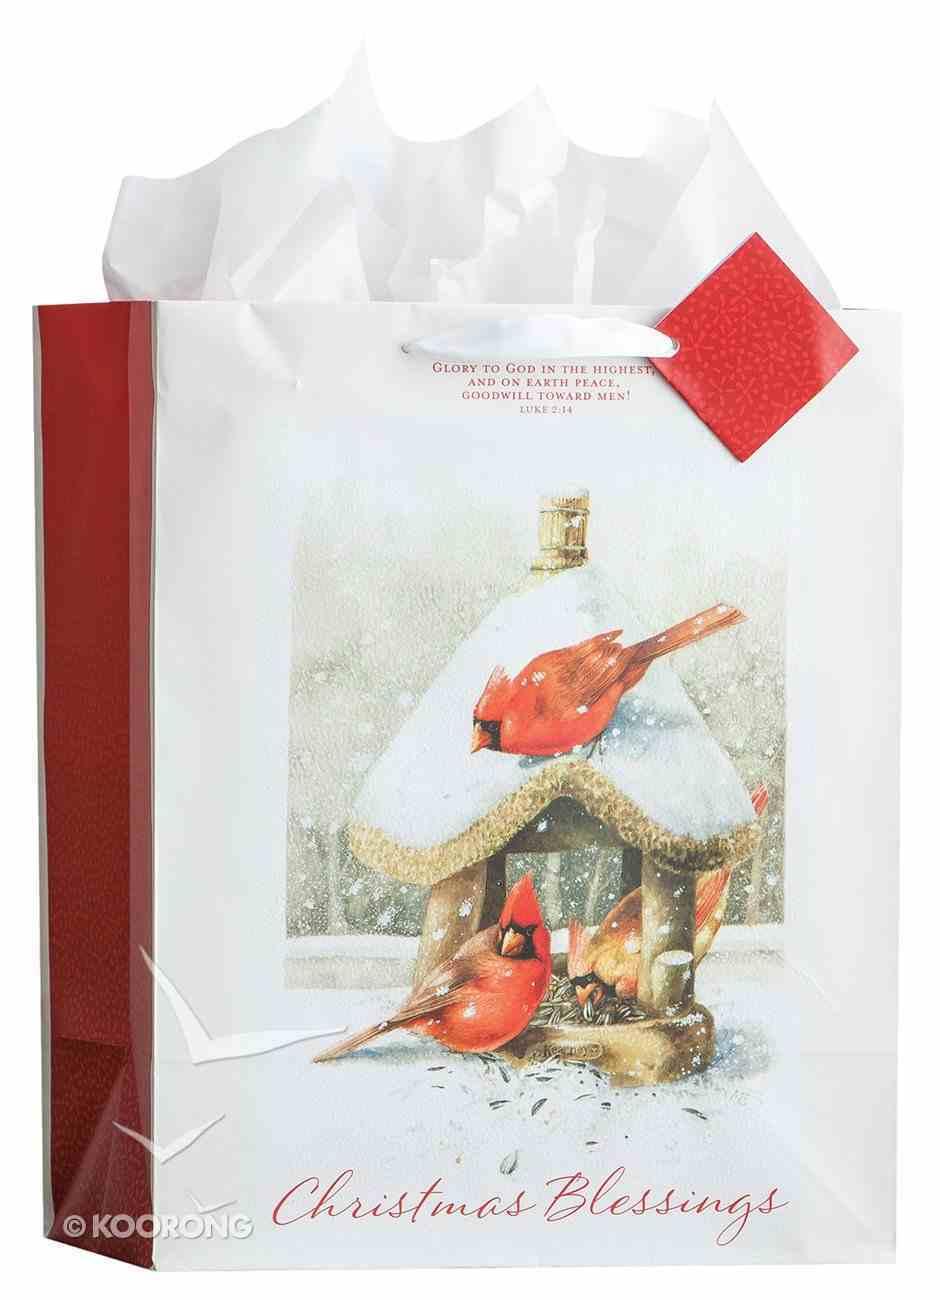 Christmas Gift Bag Large: Christmas Blessings Luke 2:14 NKJV (Incl Two Sheets Of Tissue Paper) Stationery